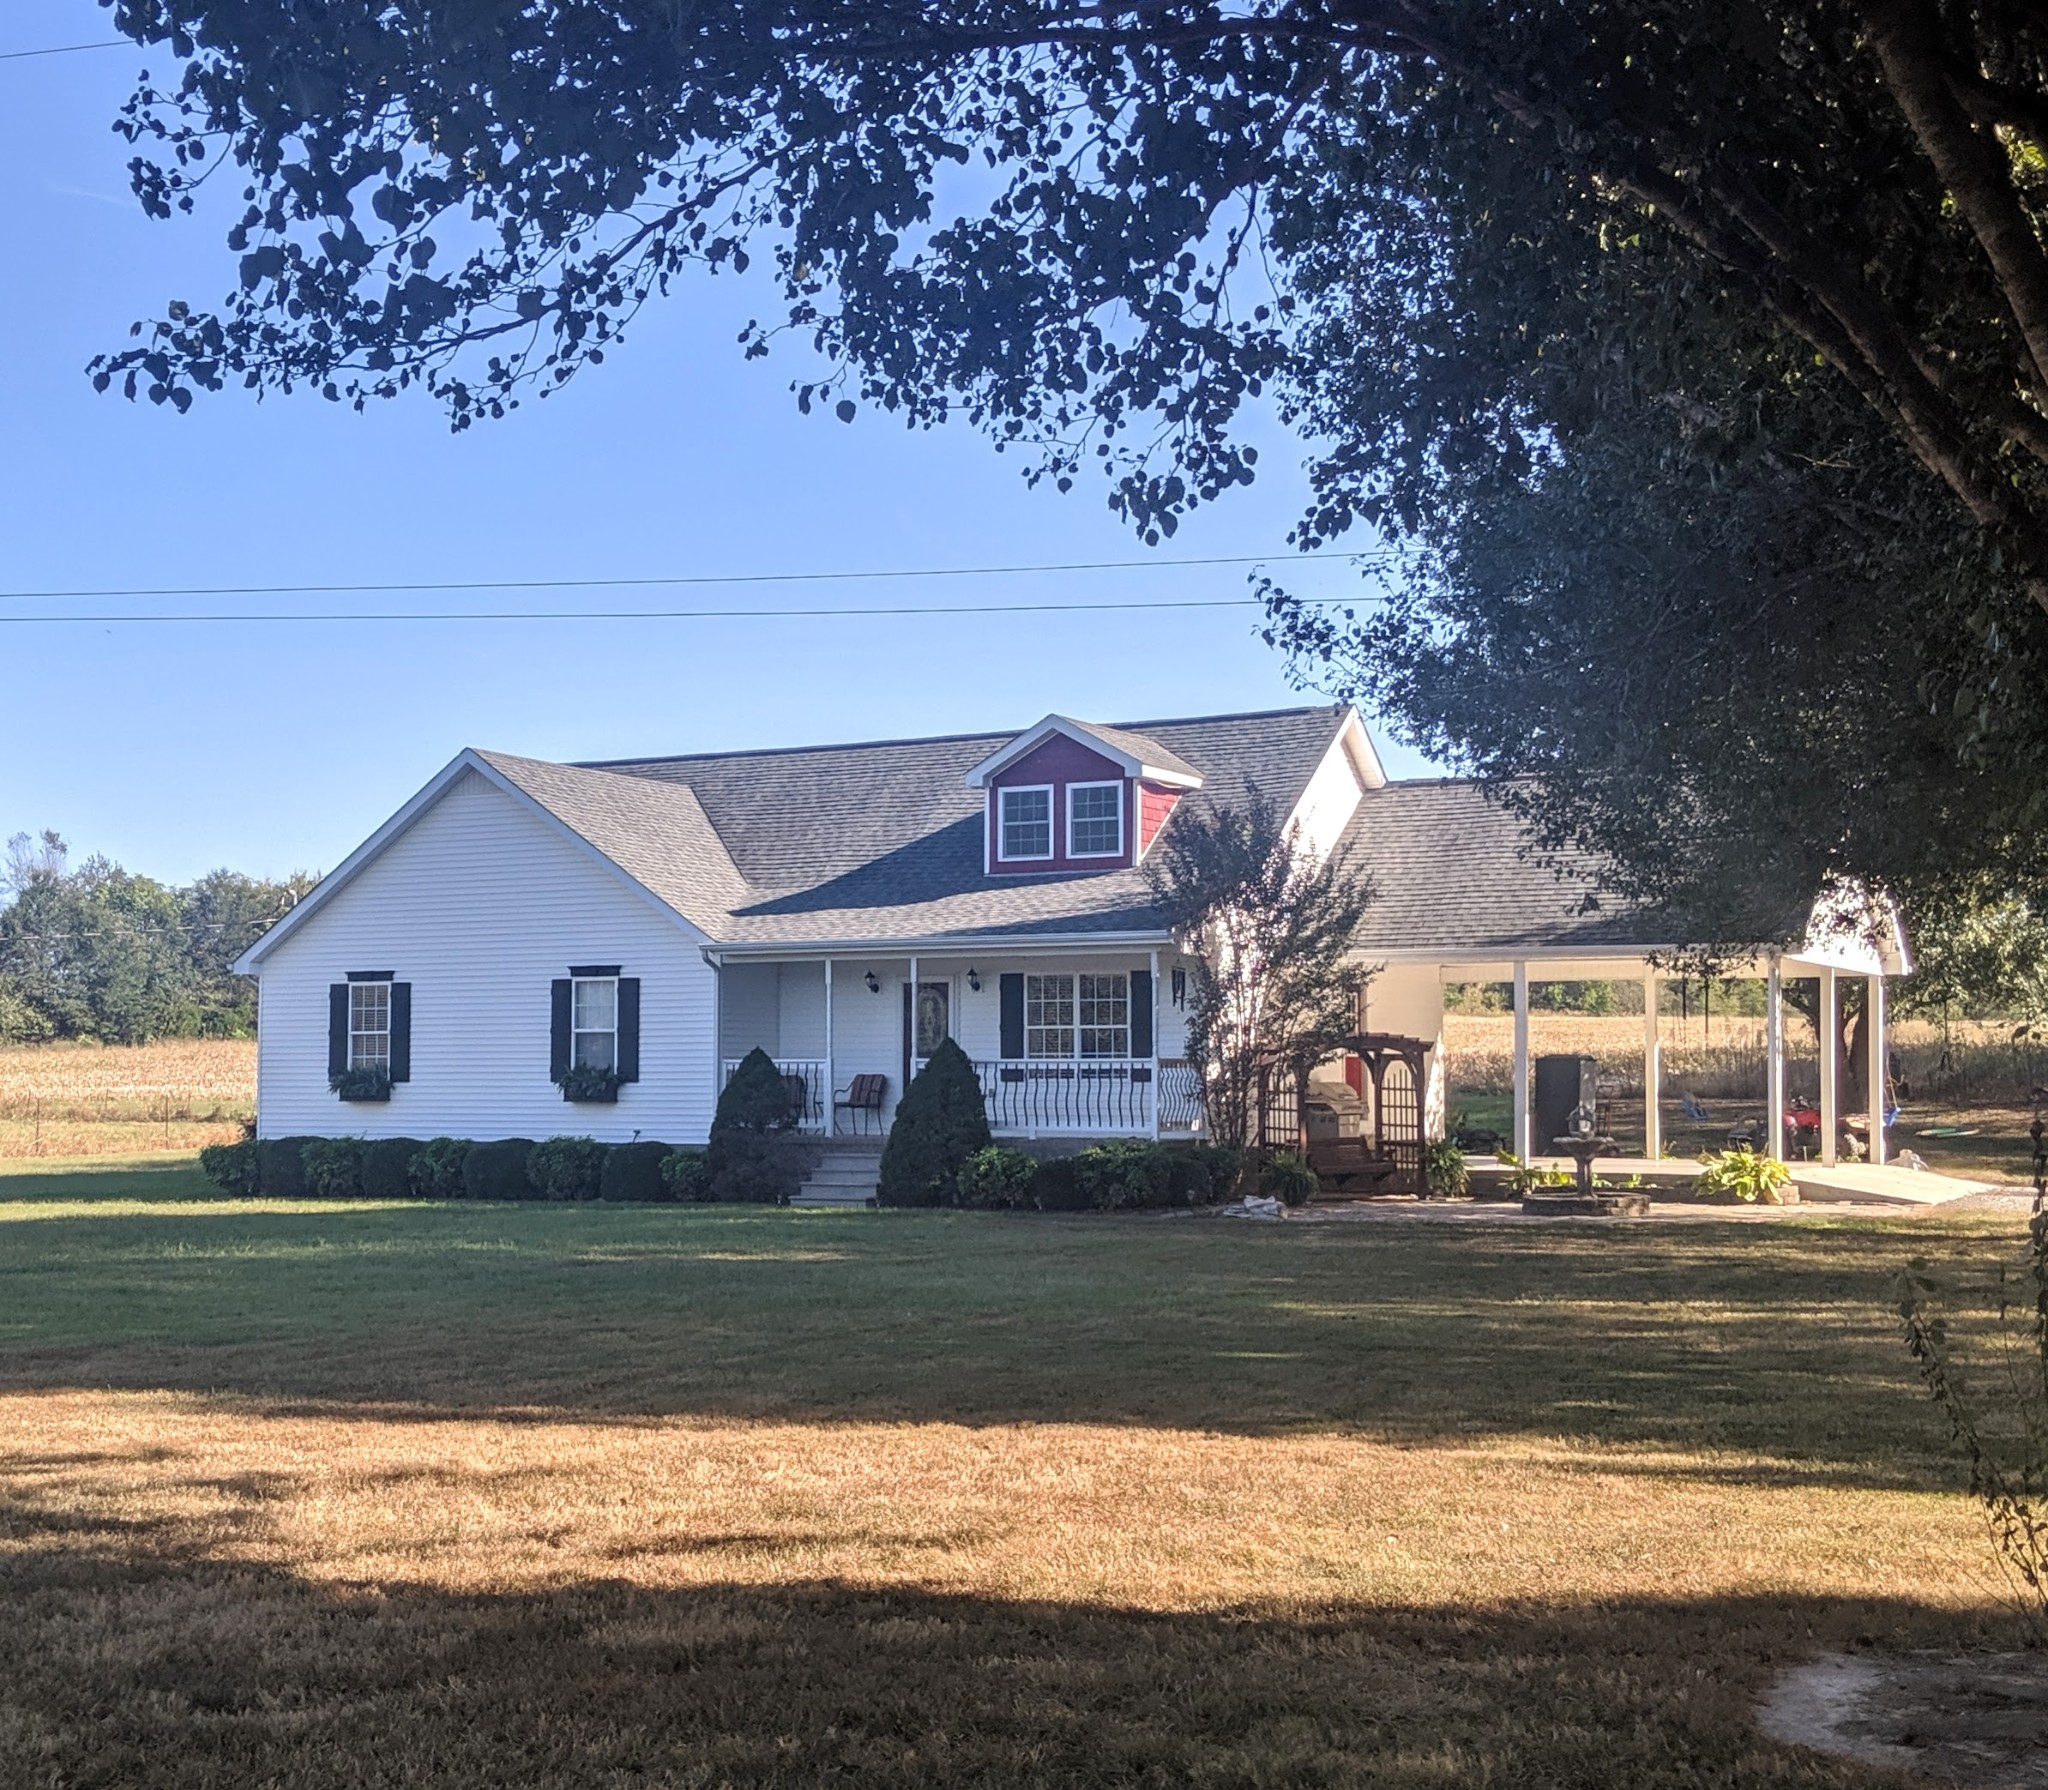 972 Mud Creek Rd, Morrison, TN 37357 - Morrison, TN real estate listing